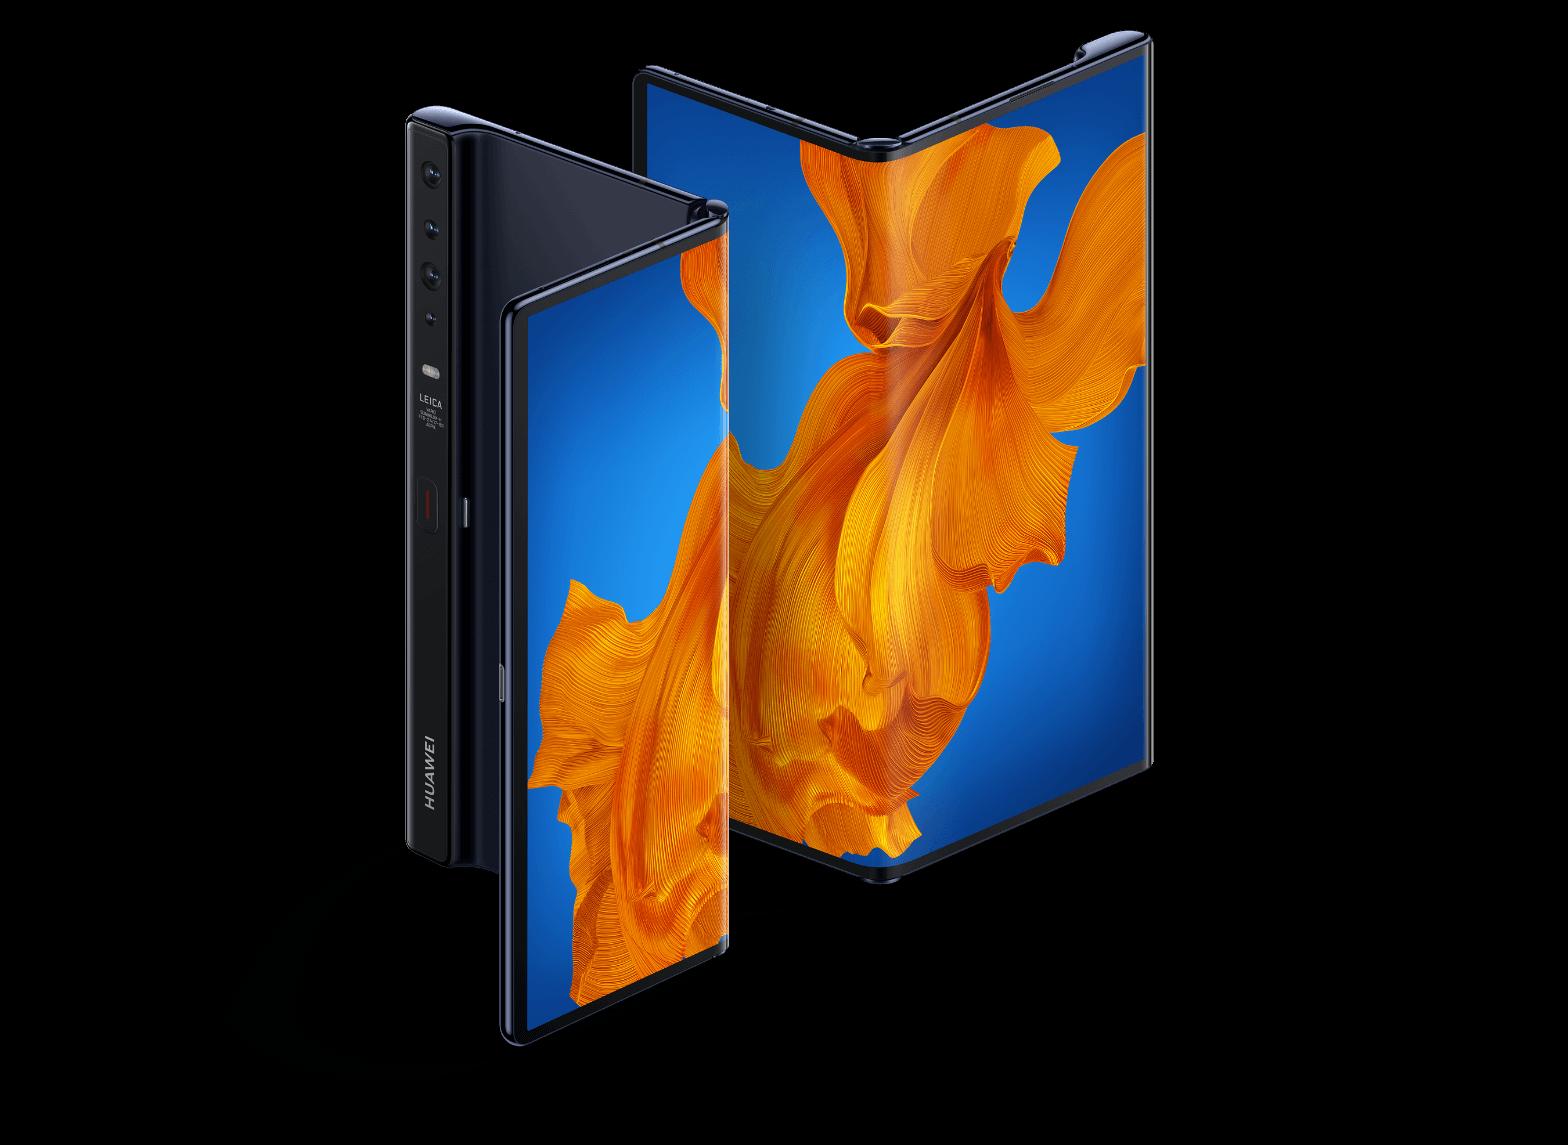 Huaweis foldbare smartphone kommer til Europa i næste...